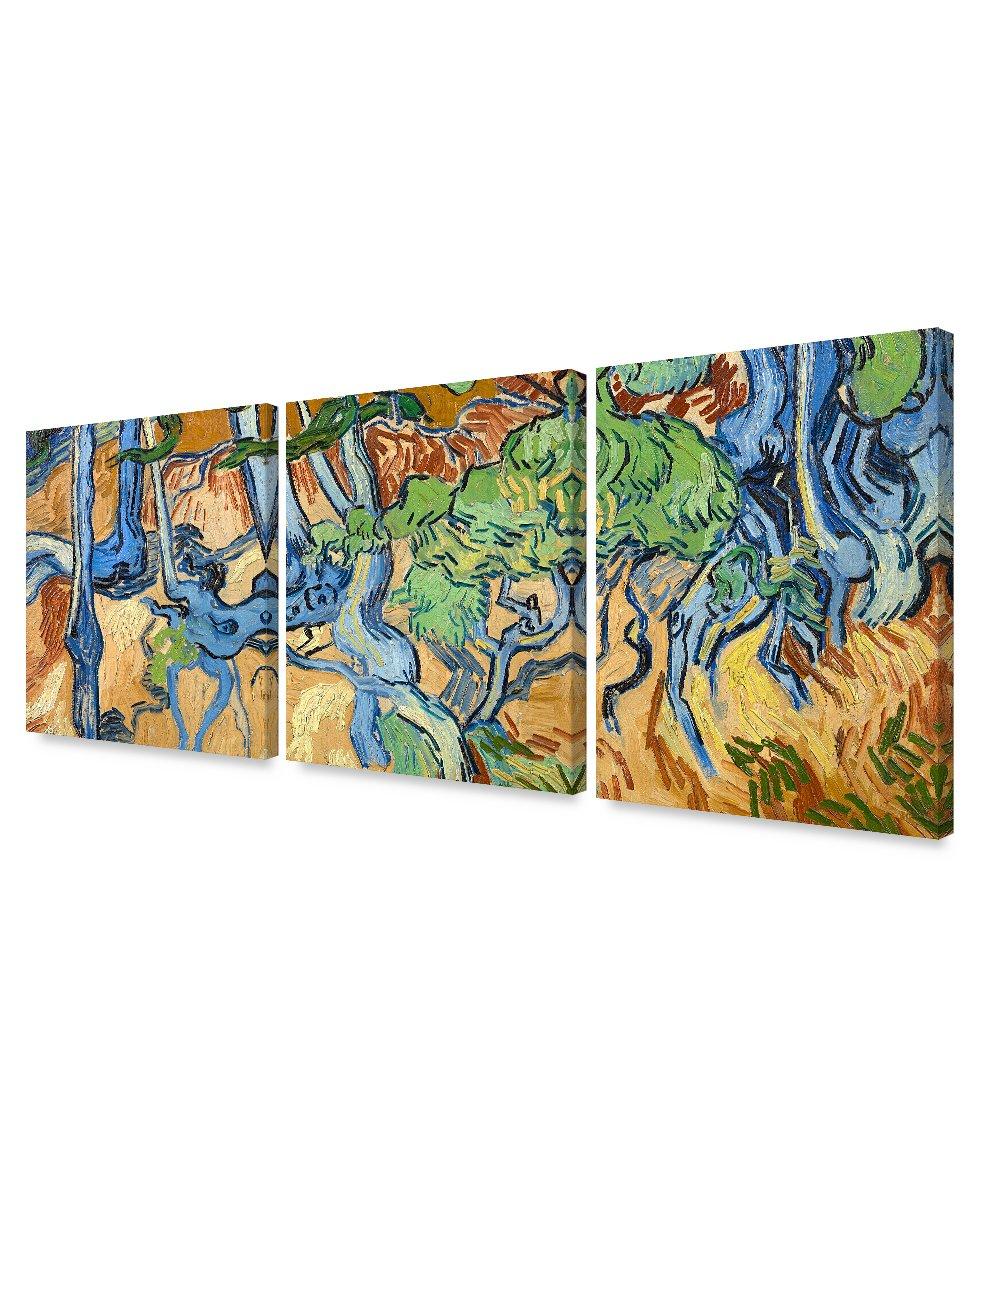 DecorArts - Tree Roots (3 Piece Set), Vincent Van Gogh Art Reproduction. Giclee Canvas Prints Wall Art for Home Decor. 24x30'', 3pcs/set